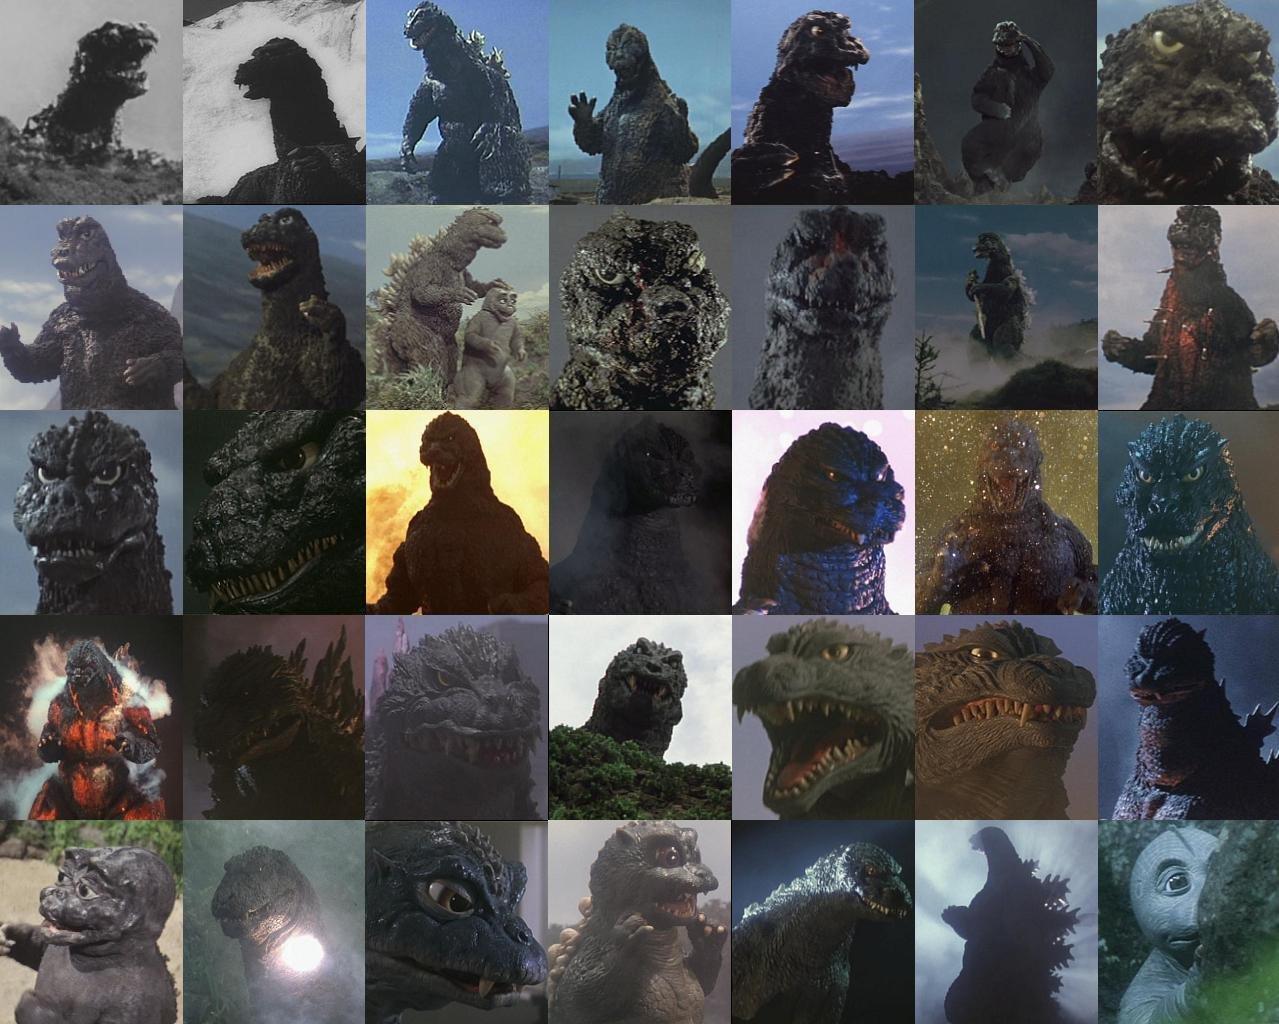 Godzilla_1954-2014_incarnations